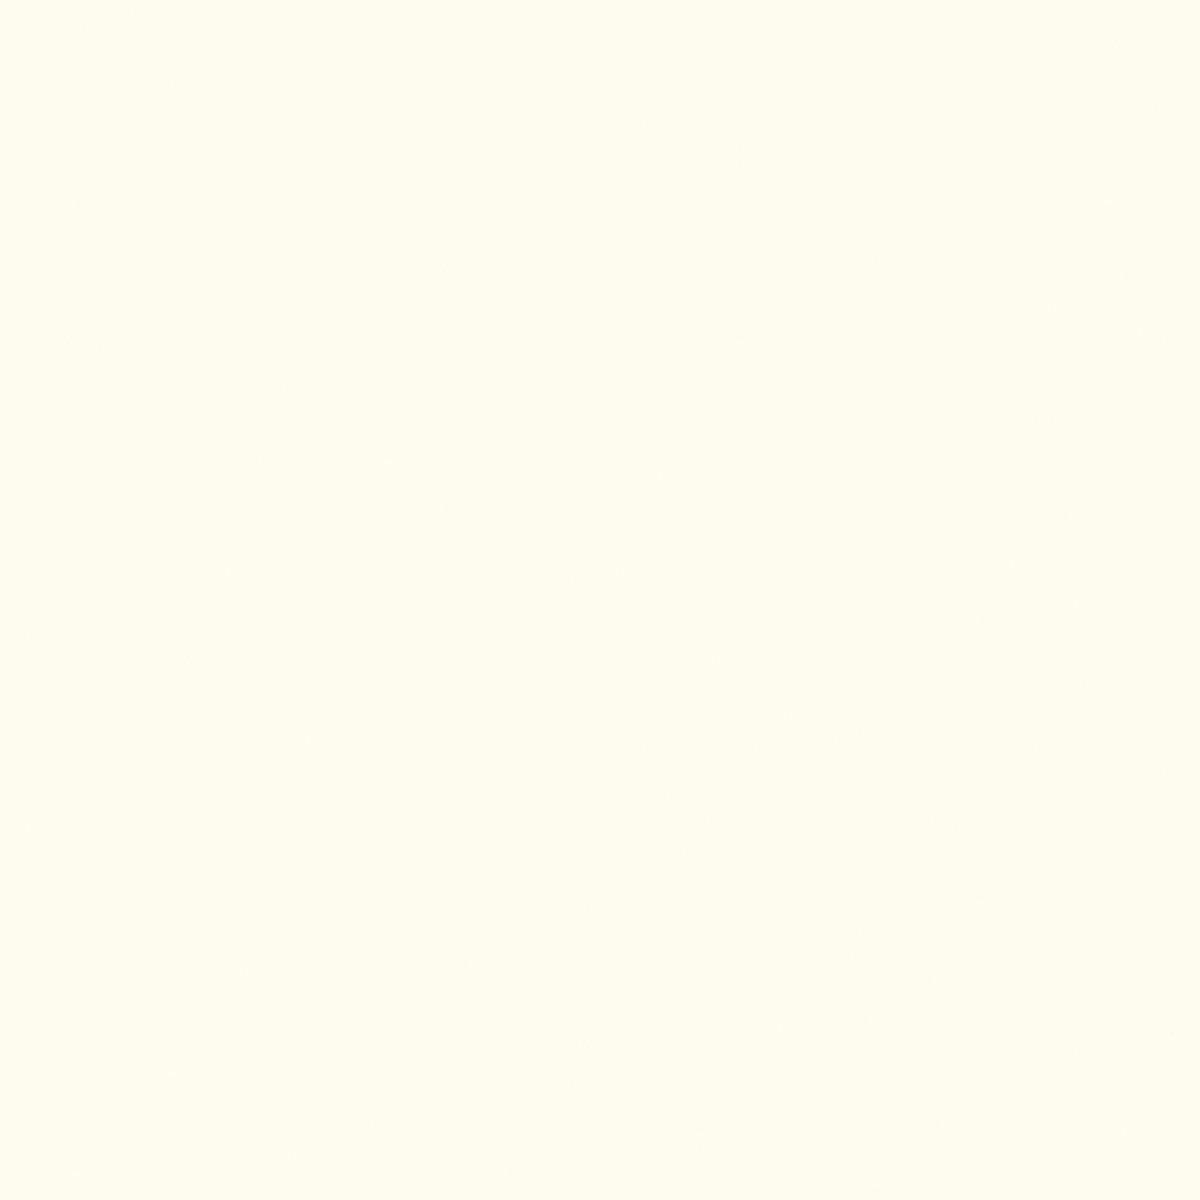 NAVLAKA ZA JASTUK ZA DOJENJE - boje pijeska, Basics, tekstil (190cm)